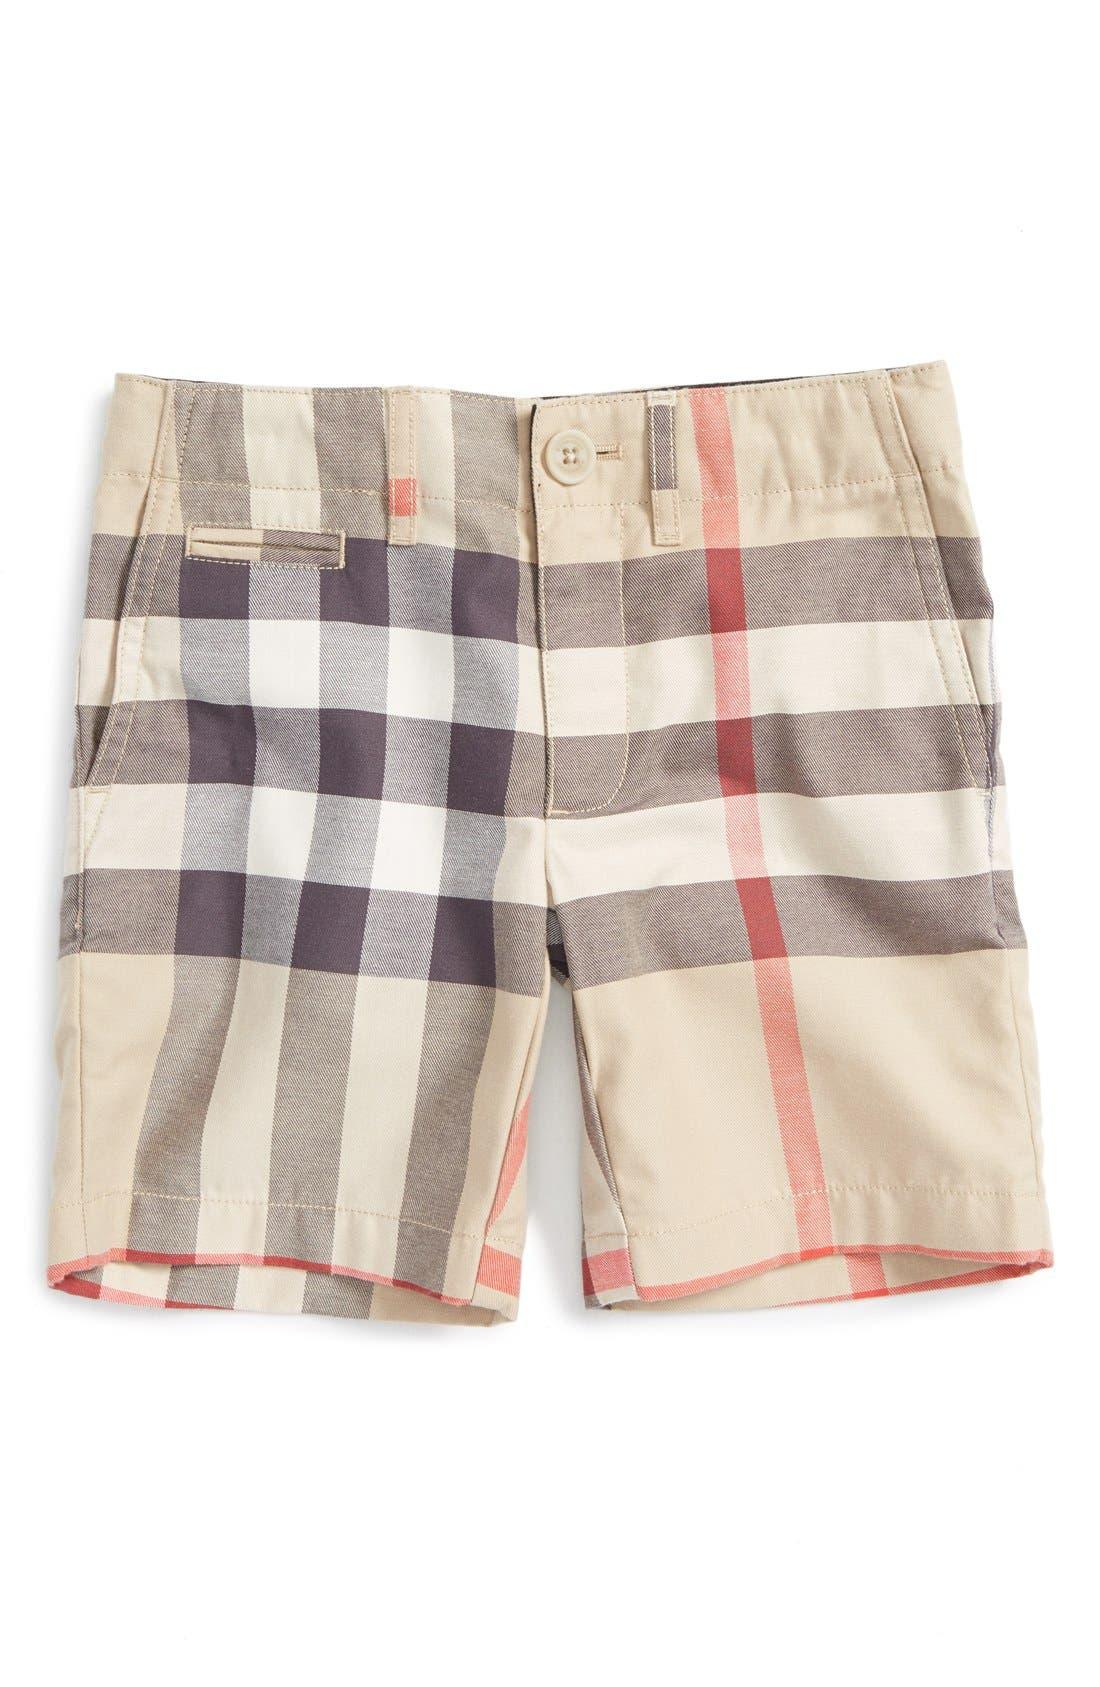 Burberry'Tristen' Check Pattern Shorts (Little Boys & BigBoys)